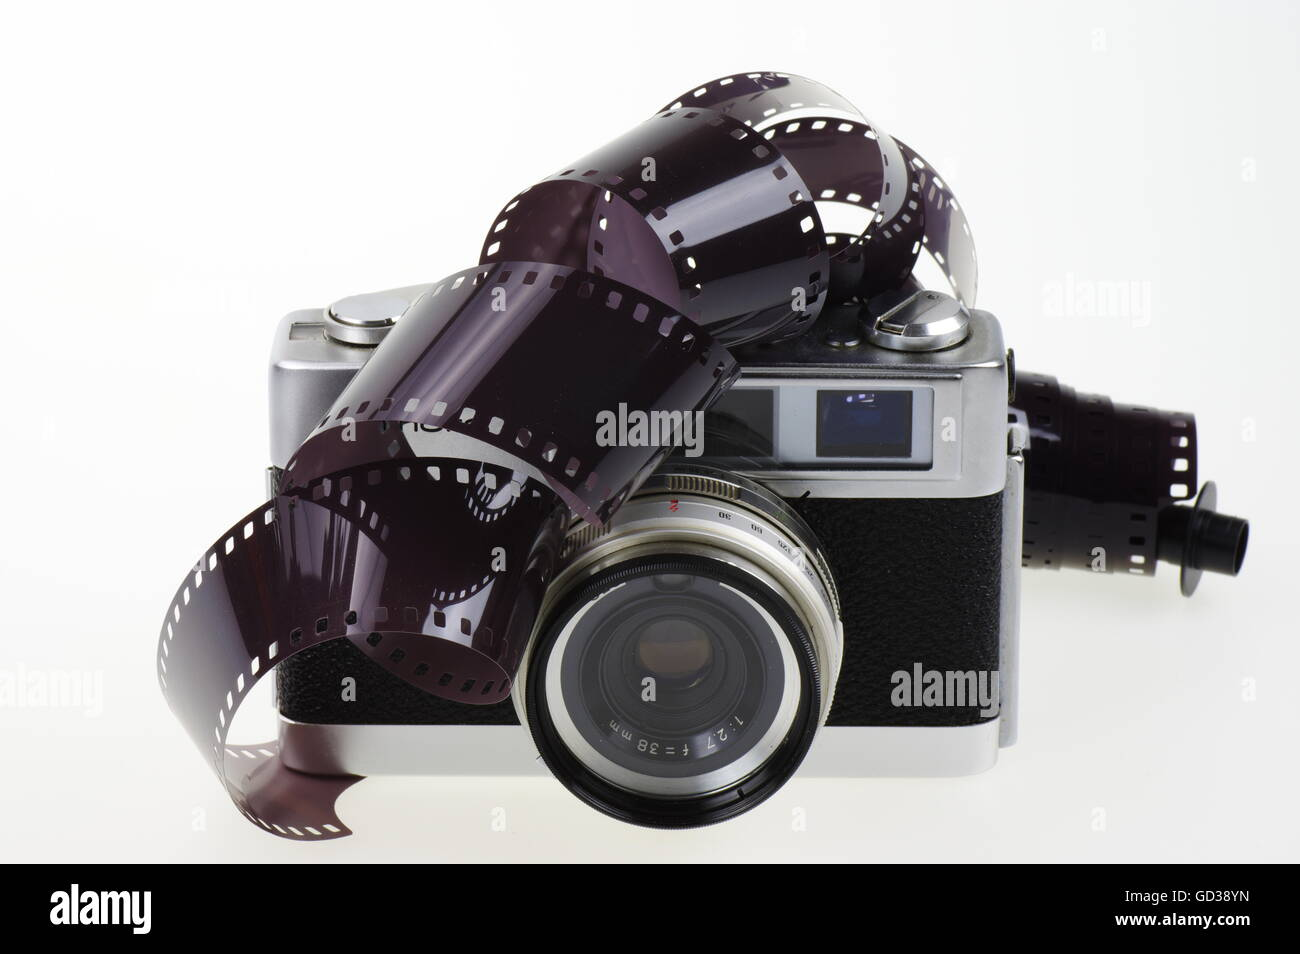 Analog Film Camera Stock Photos & Analog Film Camera Stock